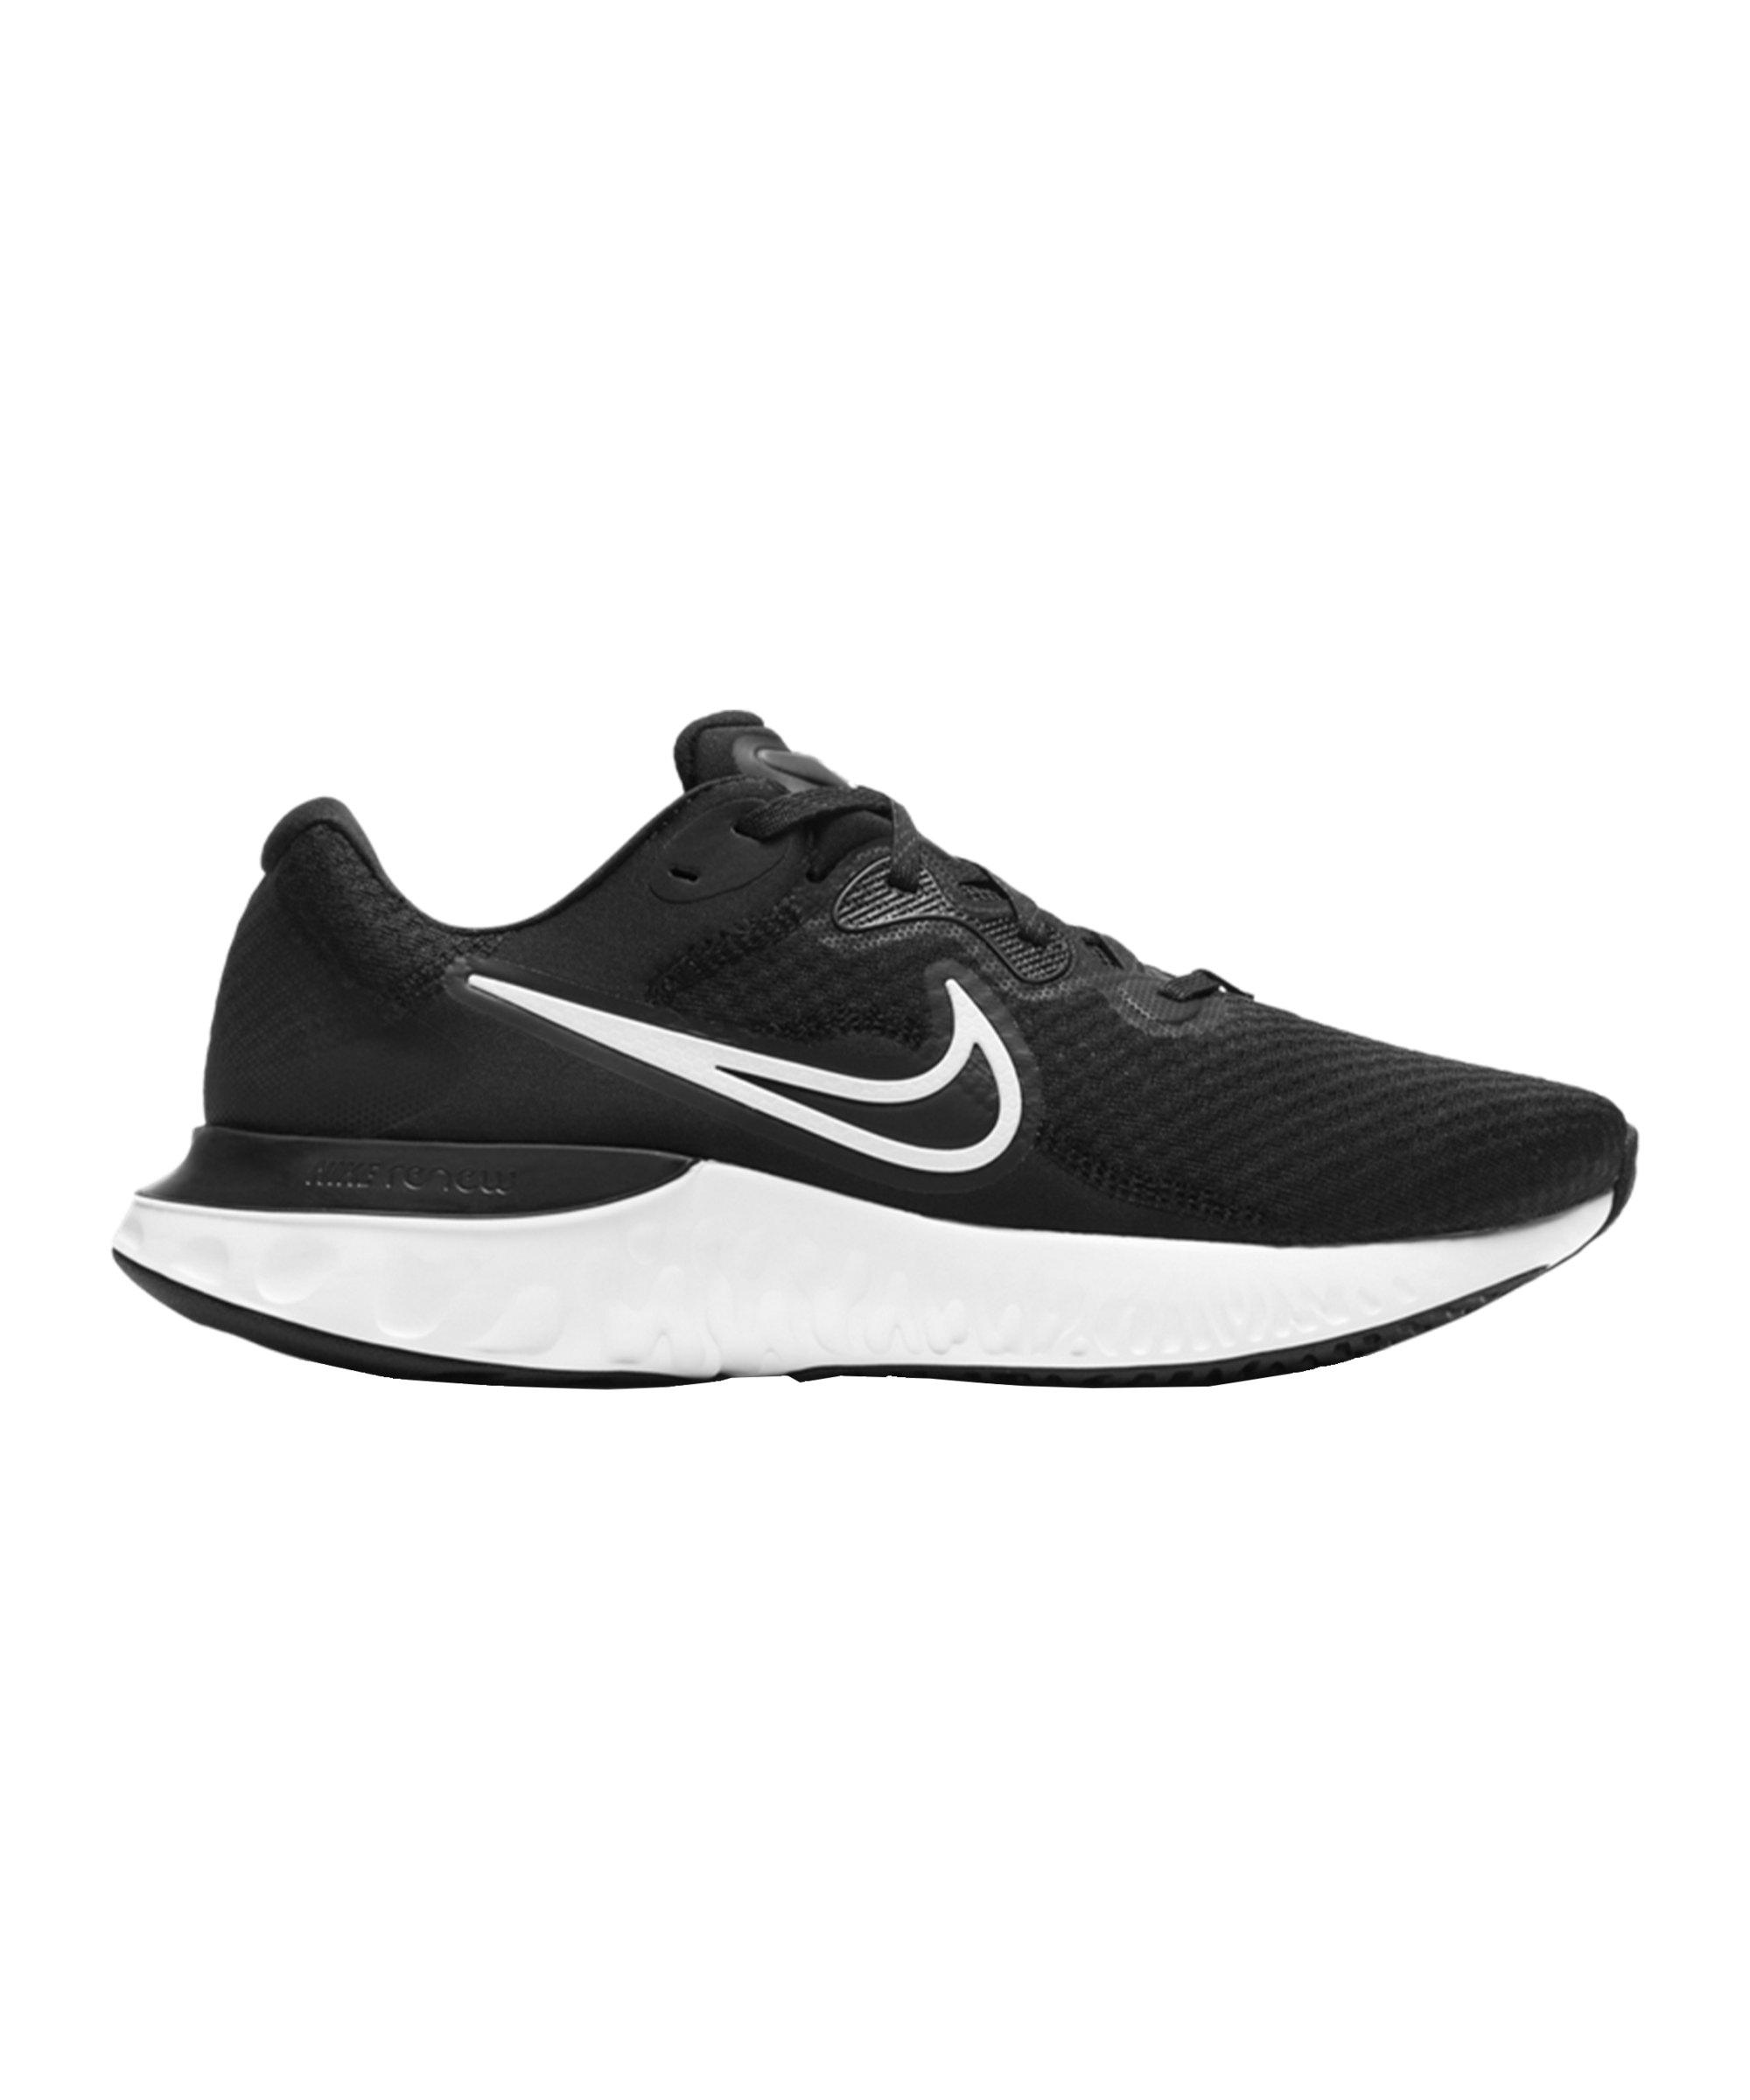 Nike Renew Run 2 Running Schwarz Weiss Grau F005 - schwarz